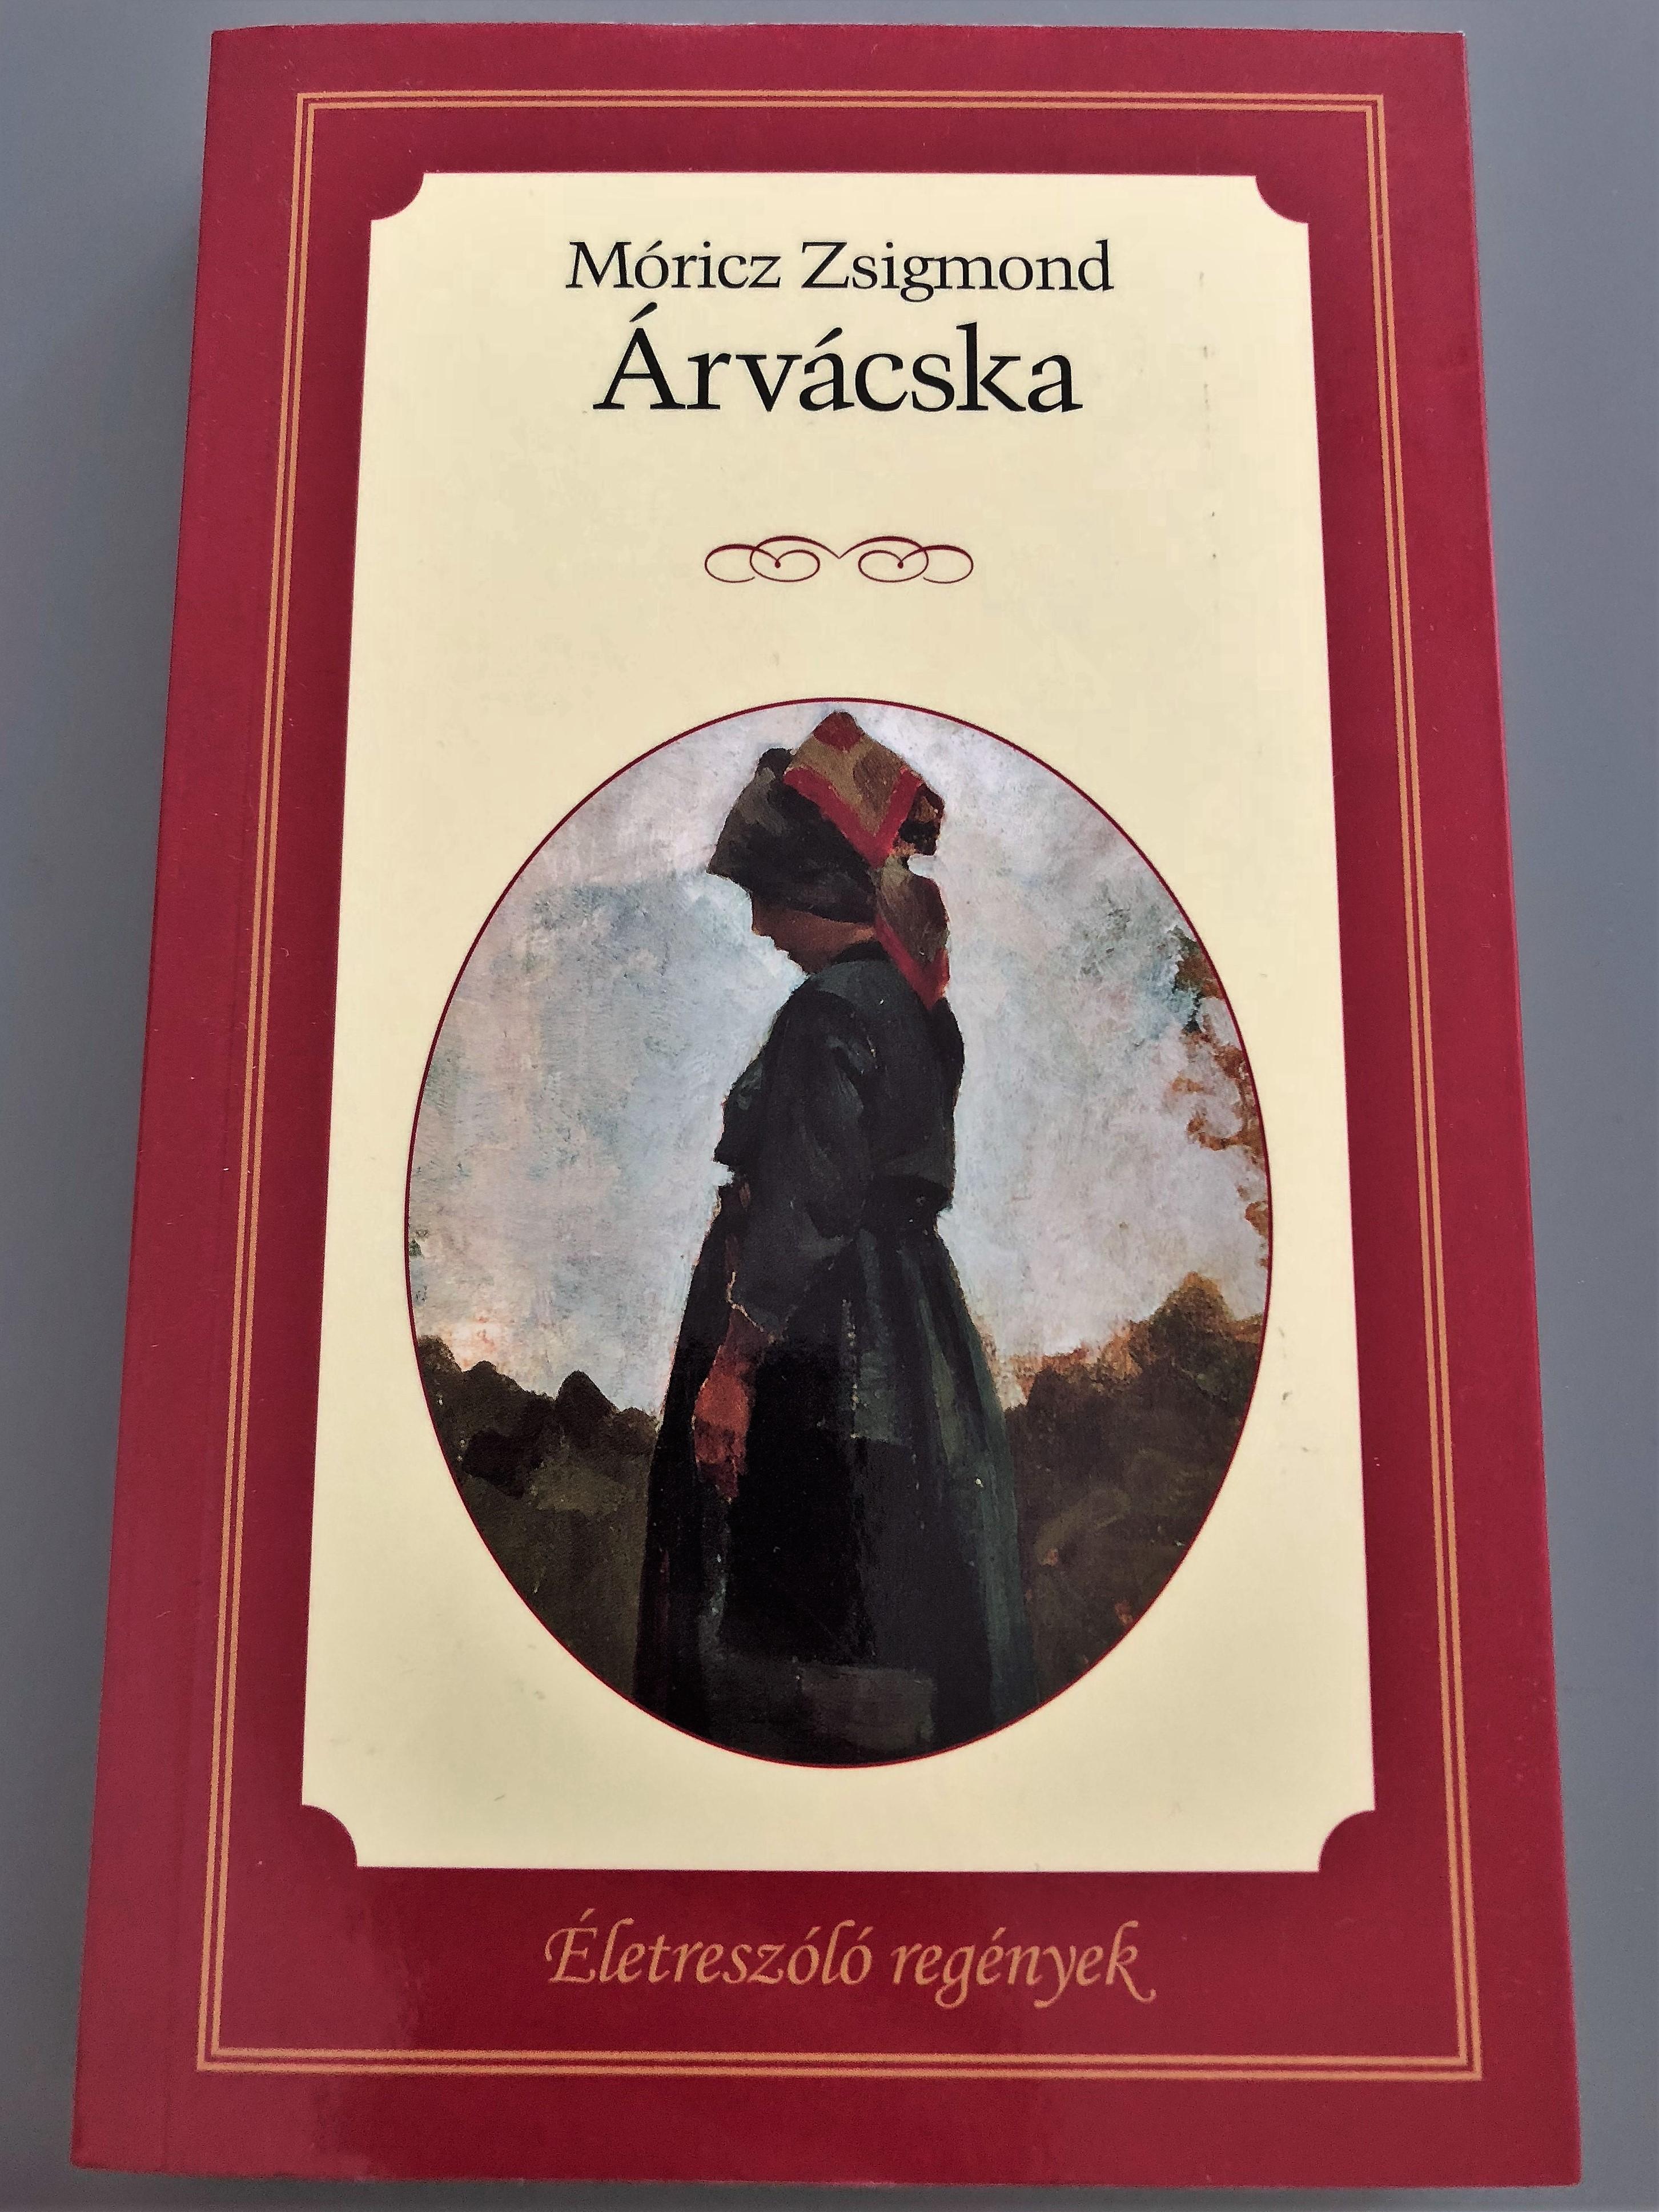 -rv-cska-by-m-ricz-zsigmond-hungarian-classic-novel-letresz-l-reg-nyek-kossuth-kiad-2015-paperback-1-.jpg